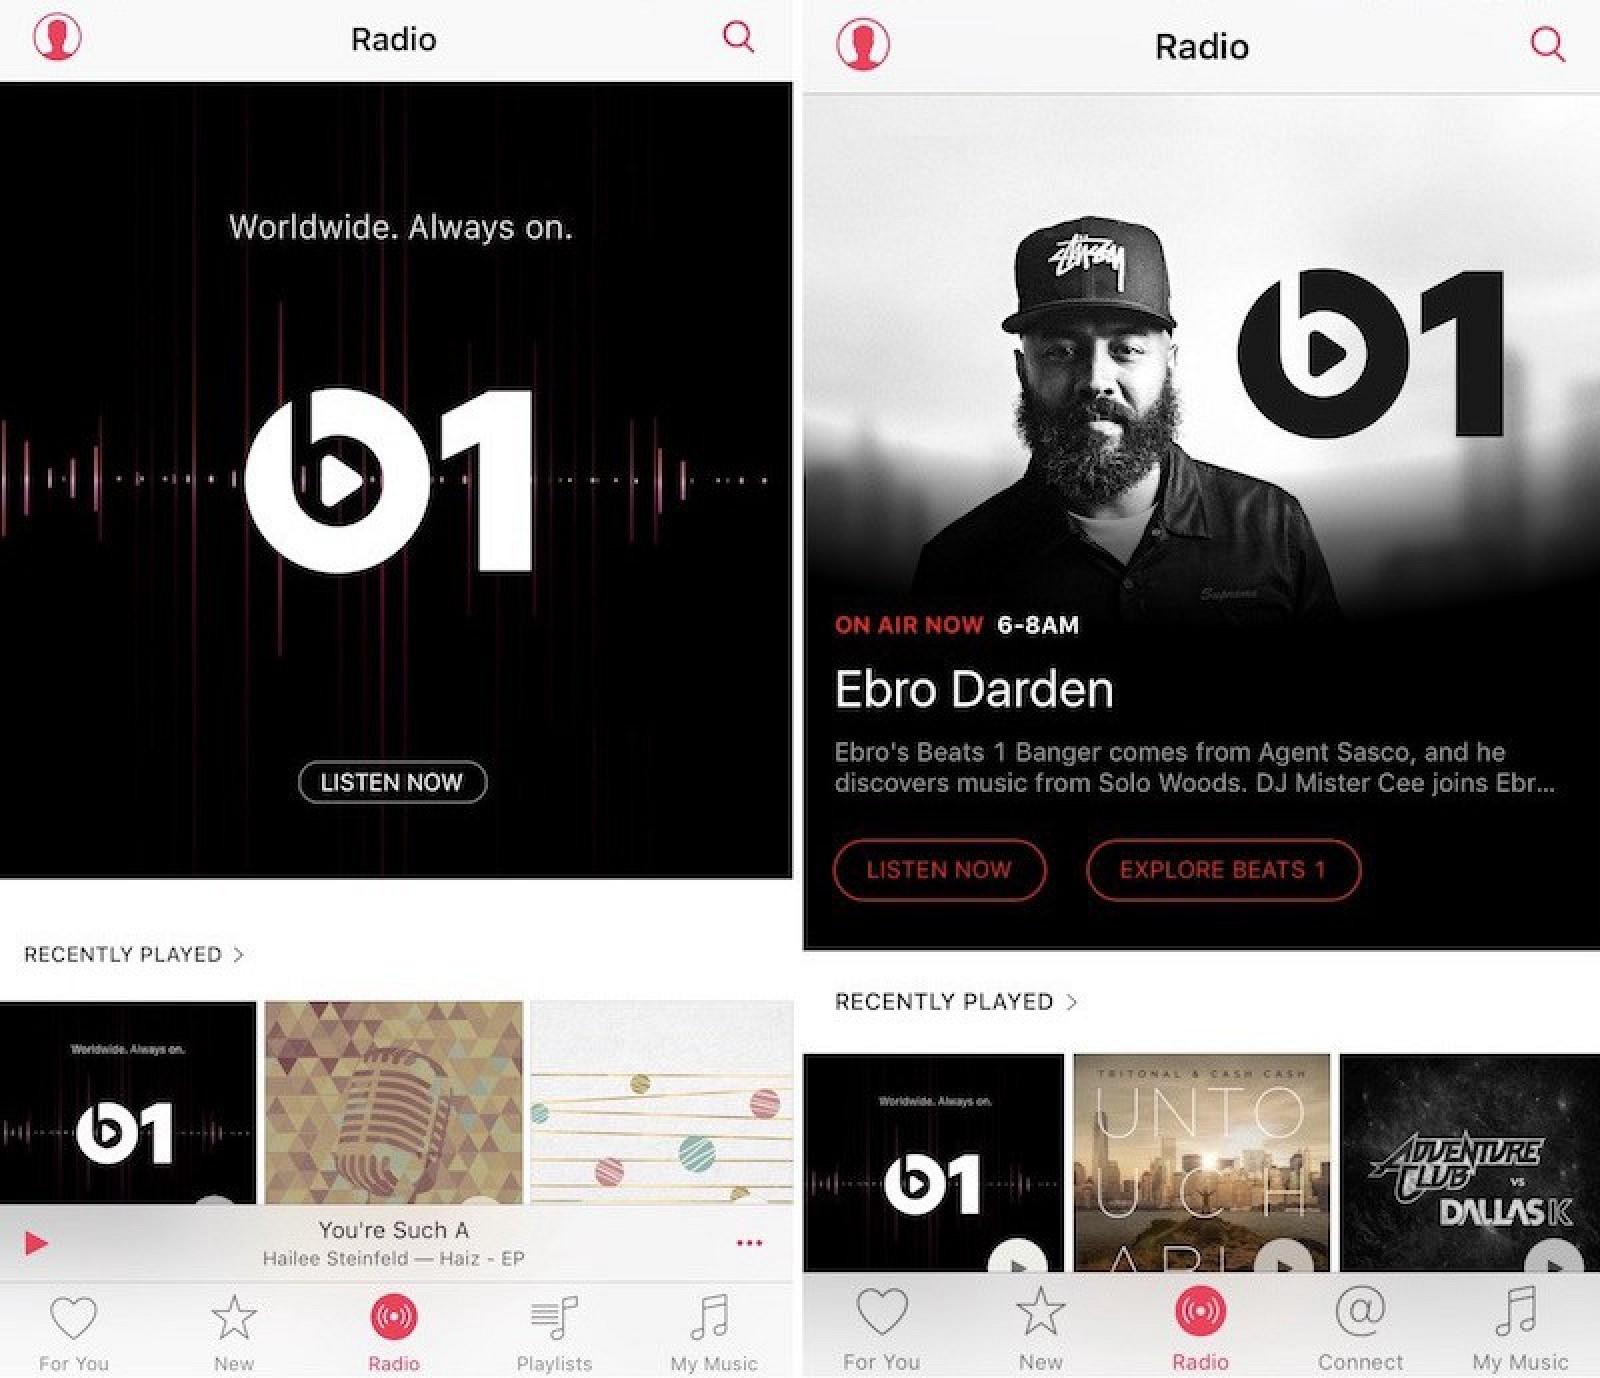 Beats-1-Radio-Tab-update-800px-800x689.jpg